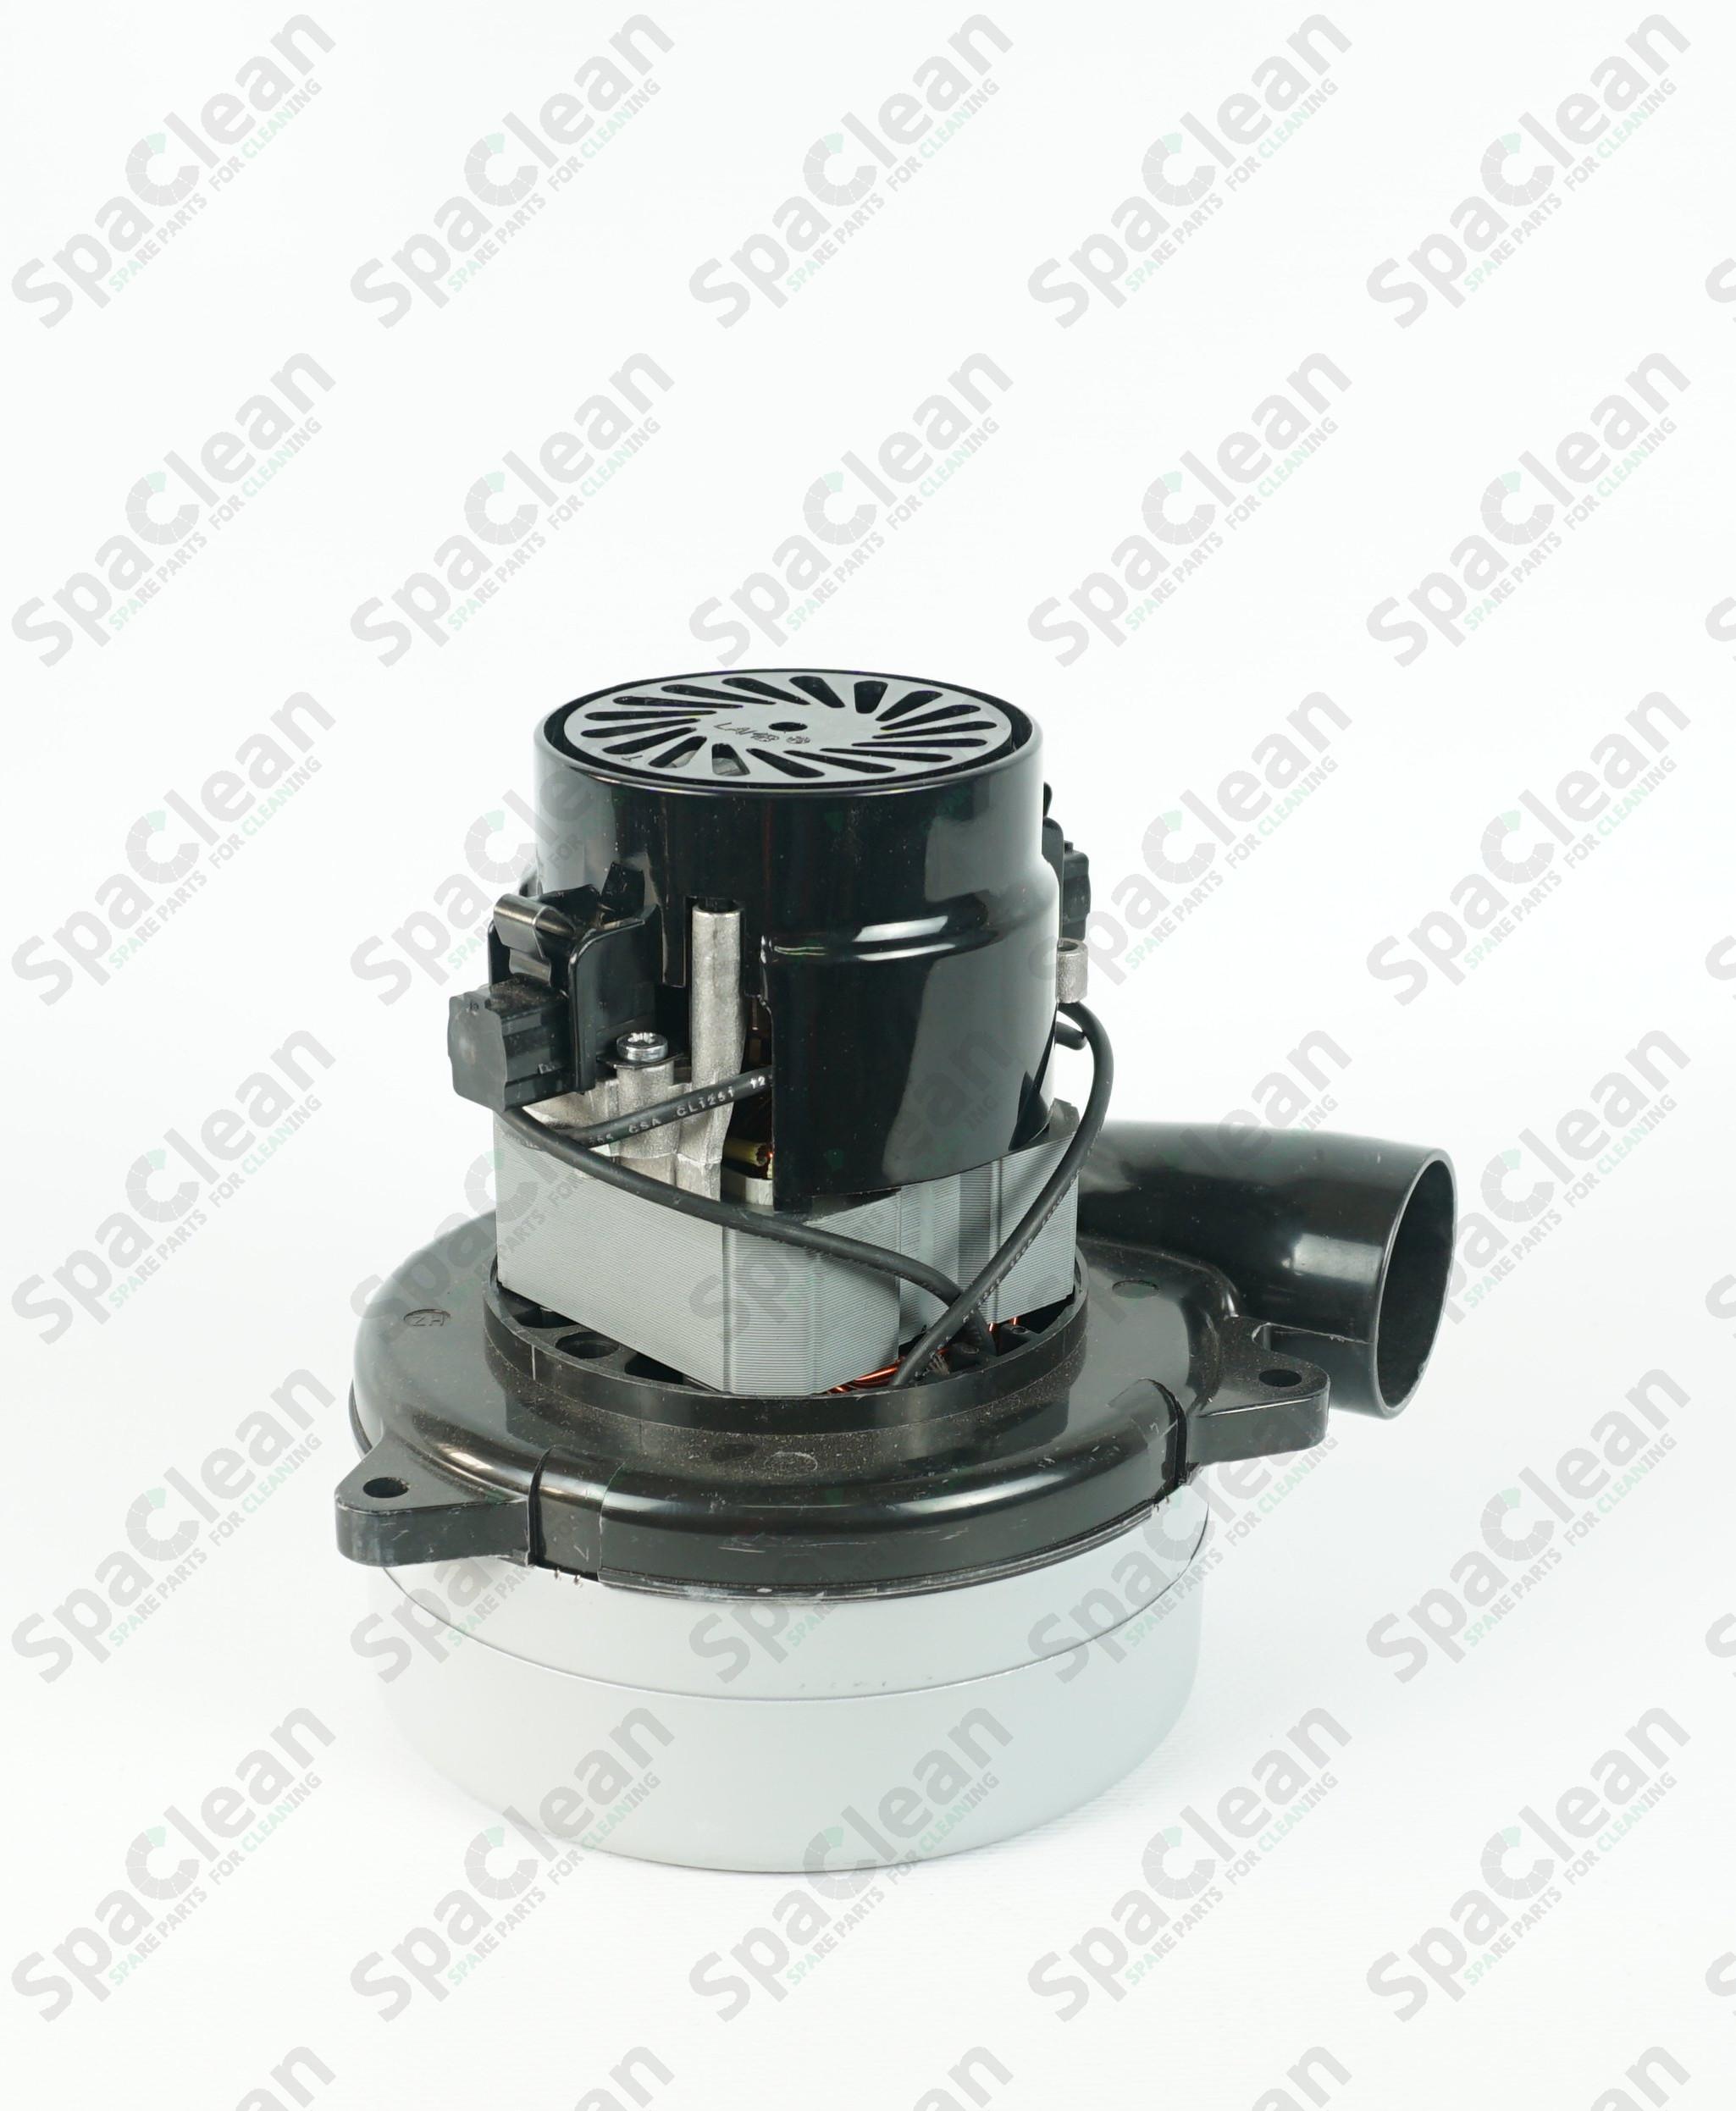 Вакуумный мотор 24V 400W Двухстадийный для Karcher B90